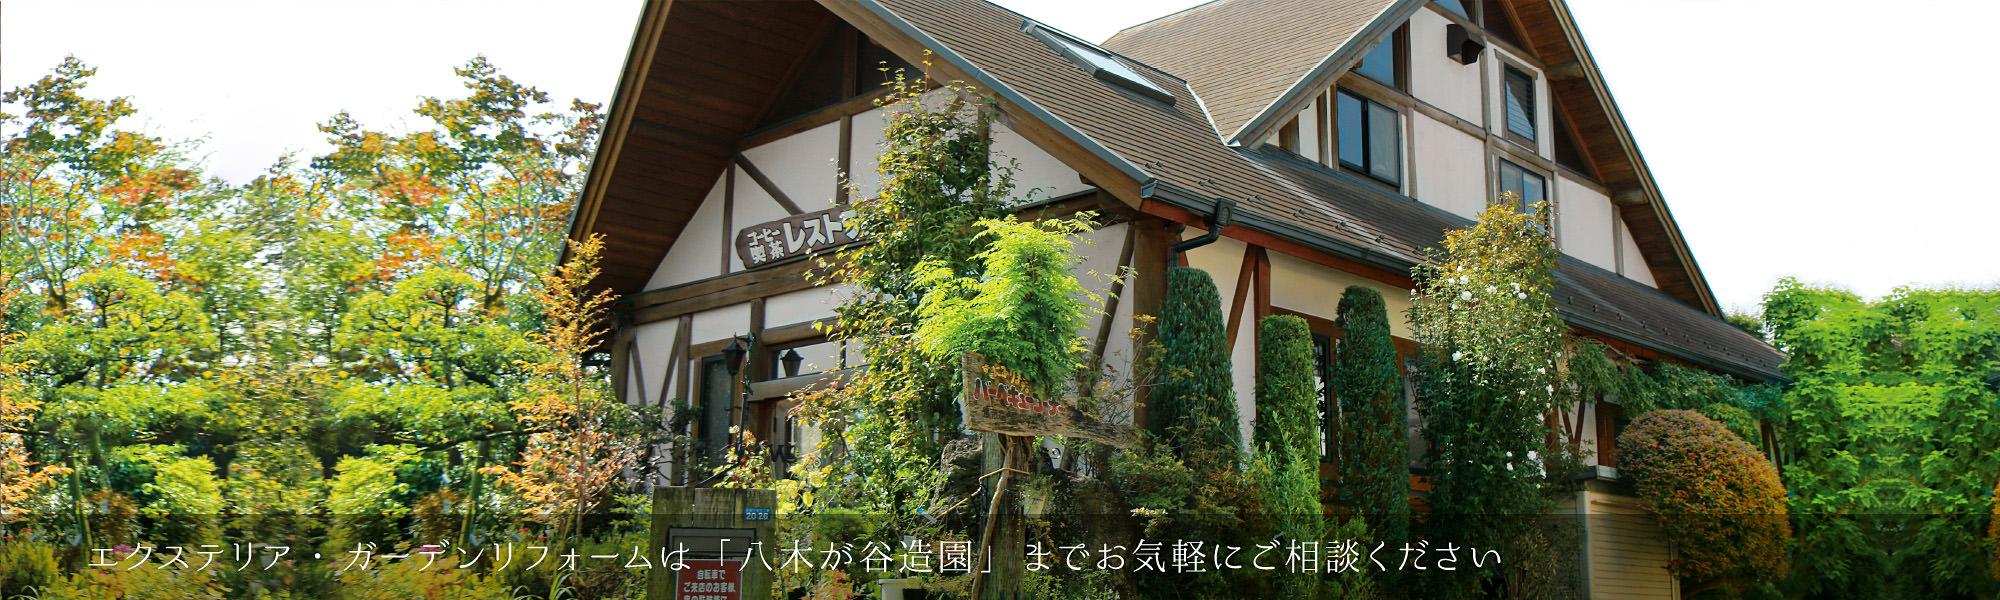 <a href='http://yakigaya-zouen.com/archives/676'></a>